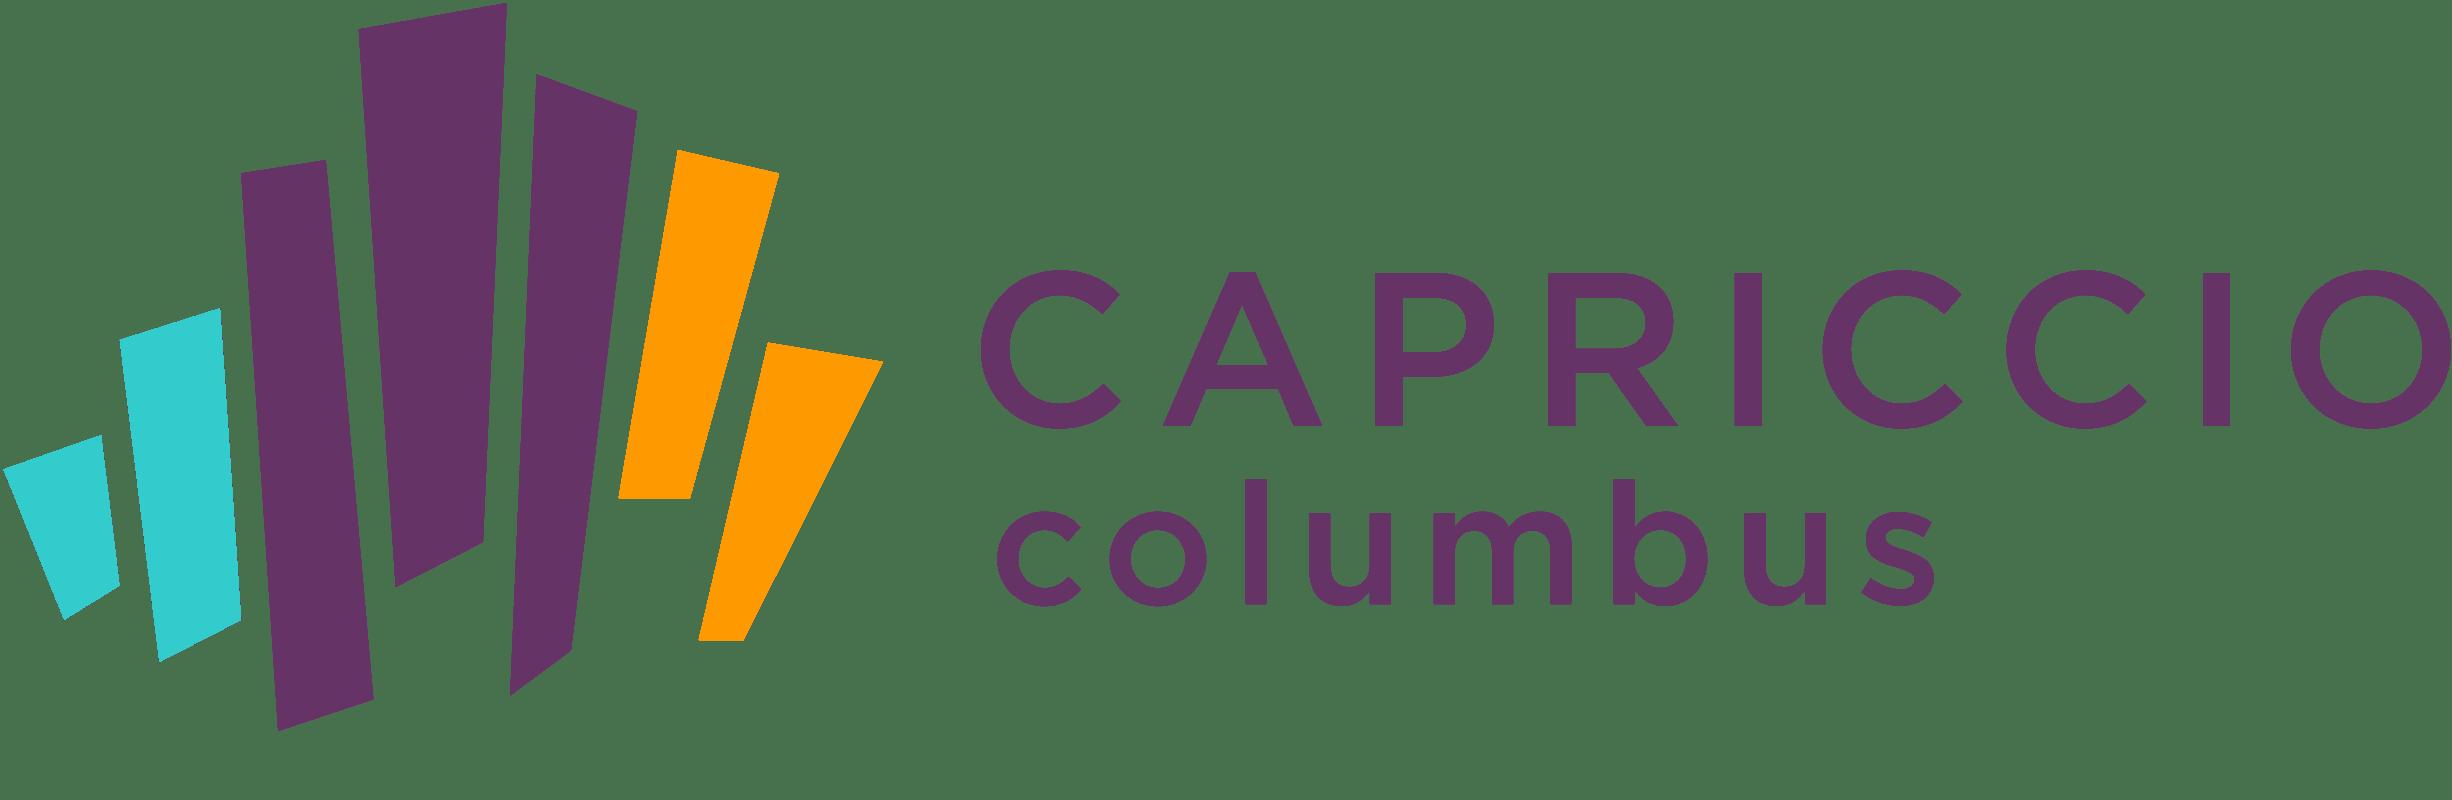 Capriccio-horizontal-FC